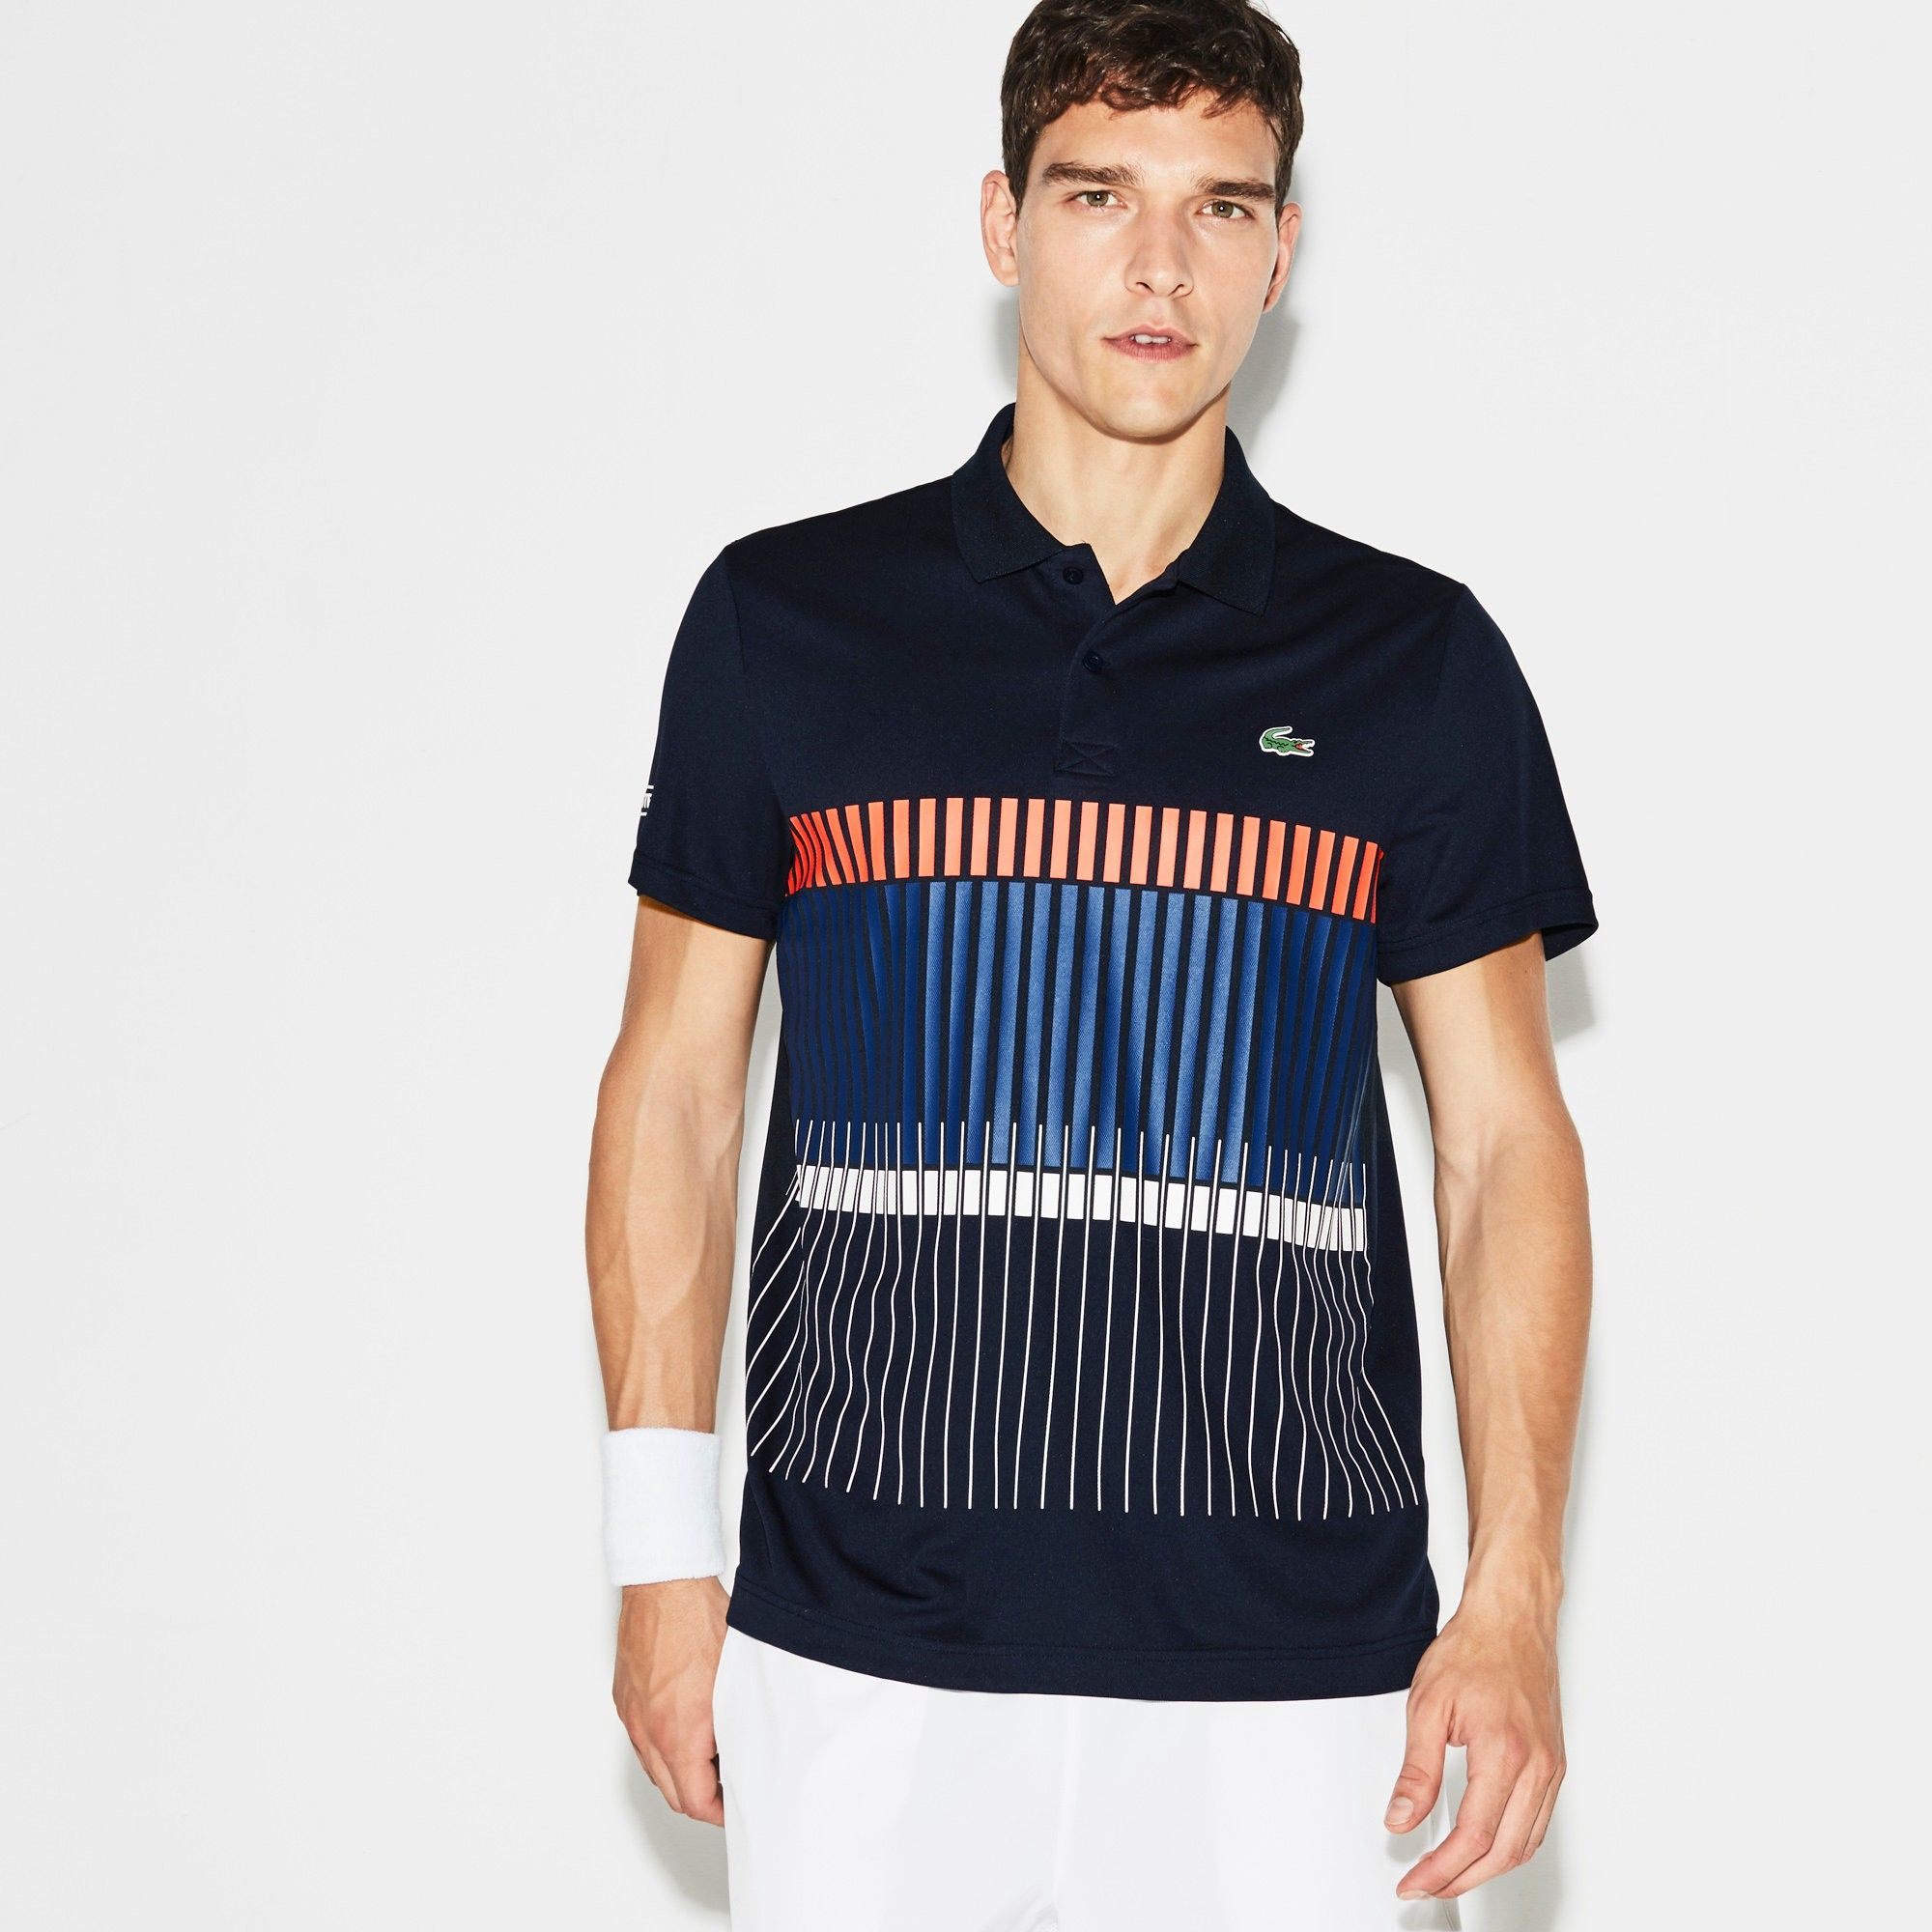 Lacoste Men S Polo X Novak Djokovic Exclusive Edition Navy Blue Mexico Red Ocea Modesens Lacoste Men Mens Outfits Lacoste